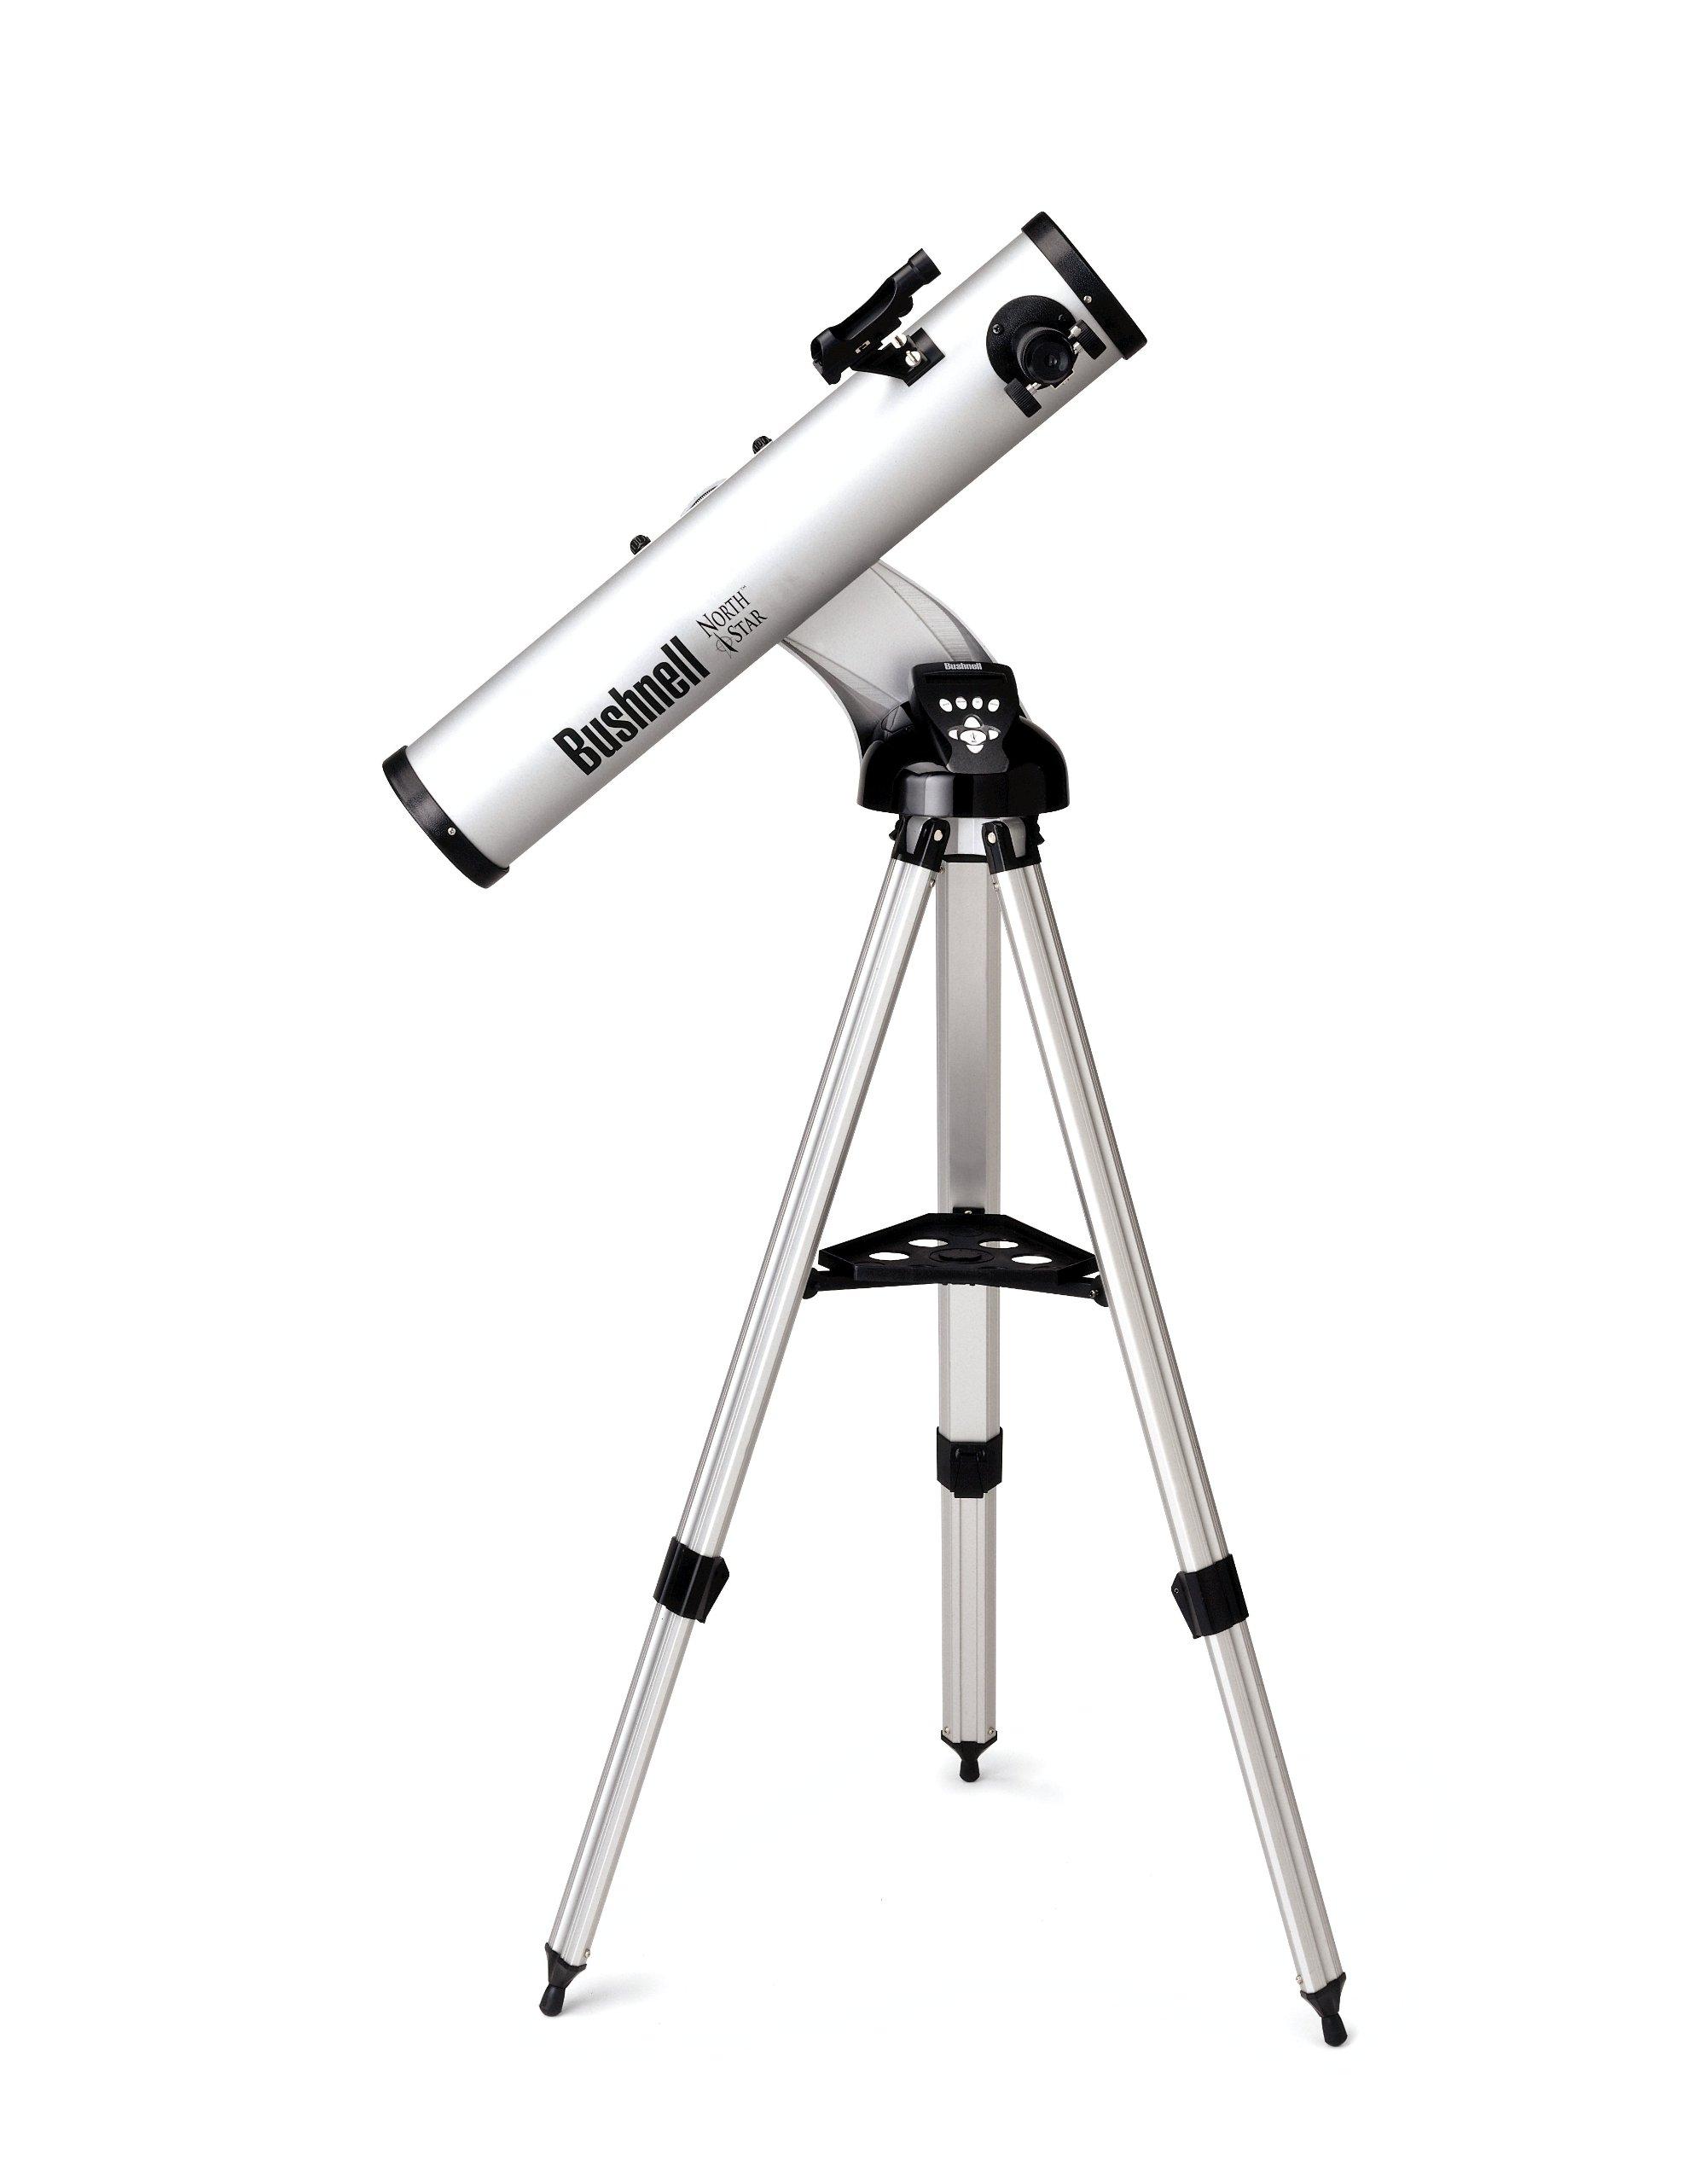 Bushnell Northstar 900x114mm Motorized Go to Reflector Telescope by Bushnell